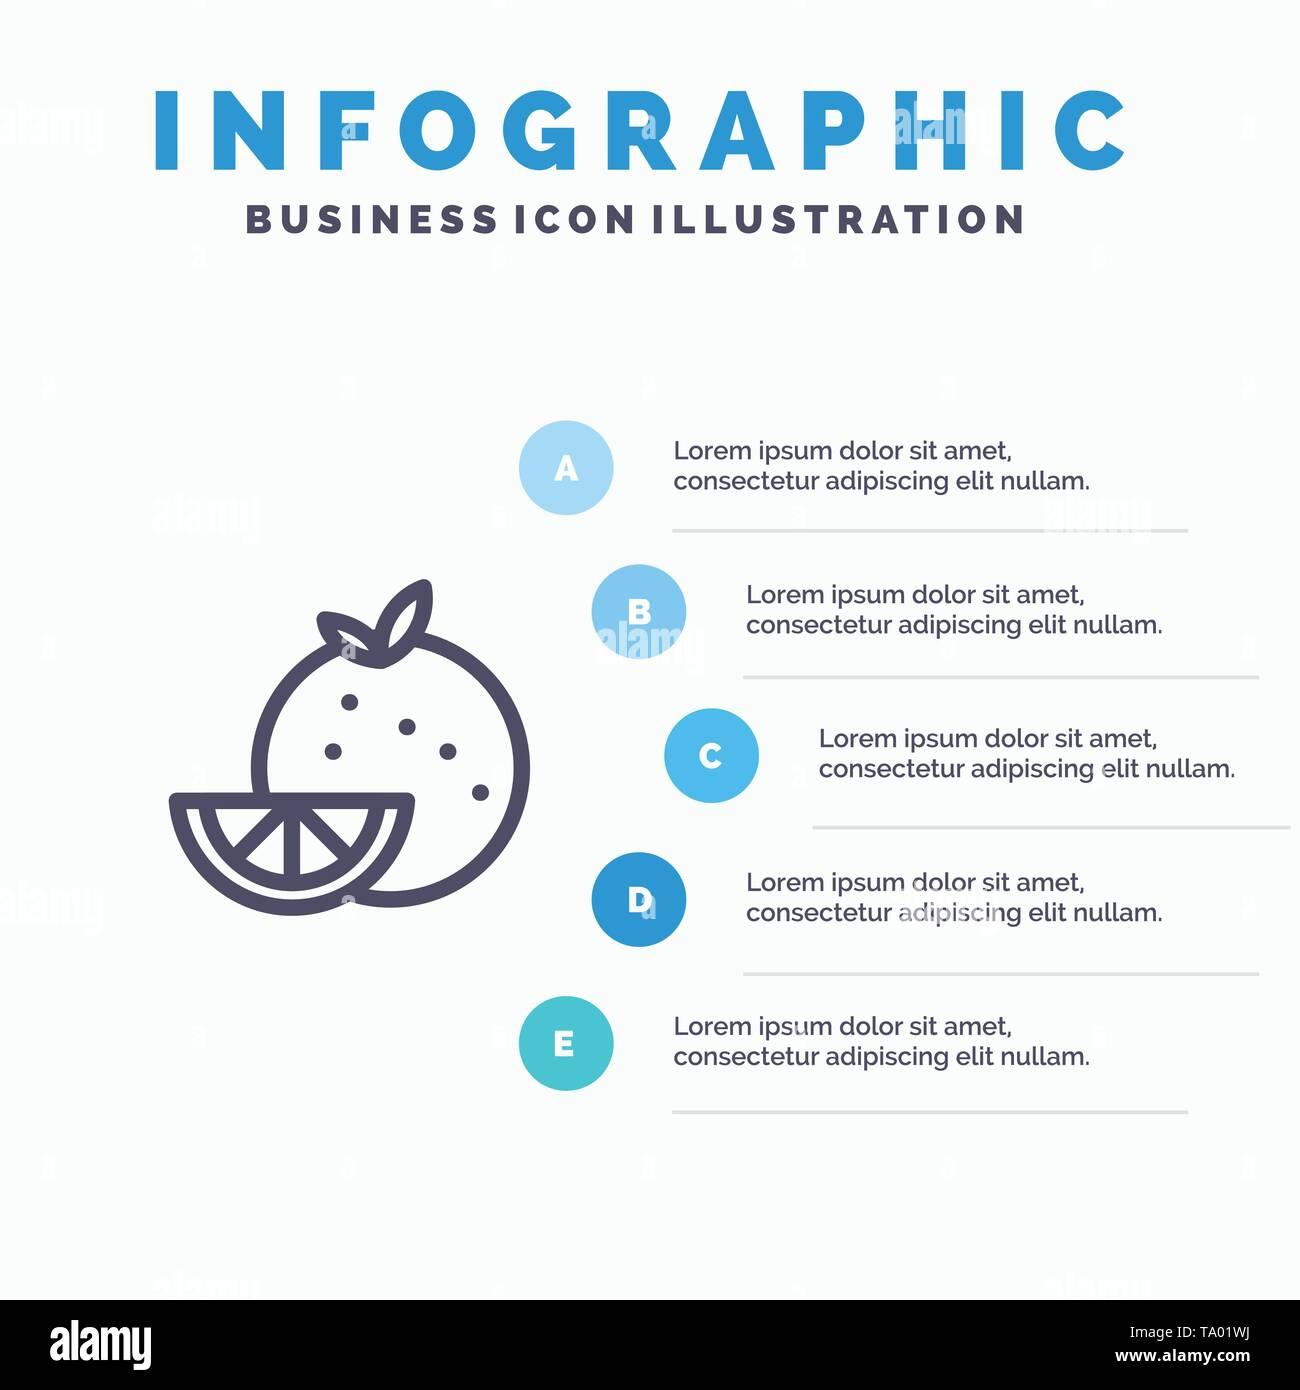 Orange, Food, Fruit, Madrigal Line icon with 5 steps presentation infographics Background - Stock Image